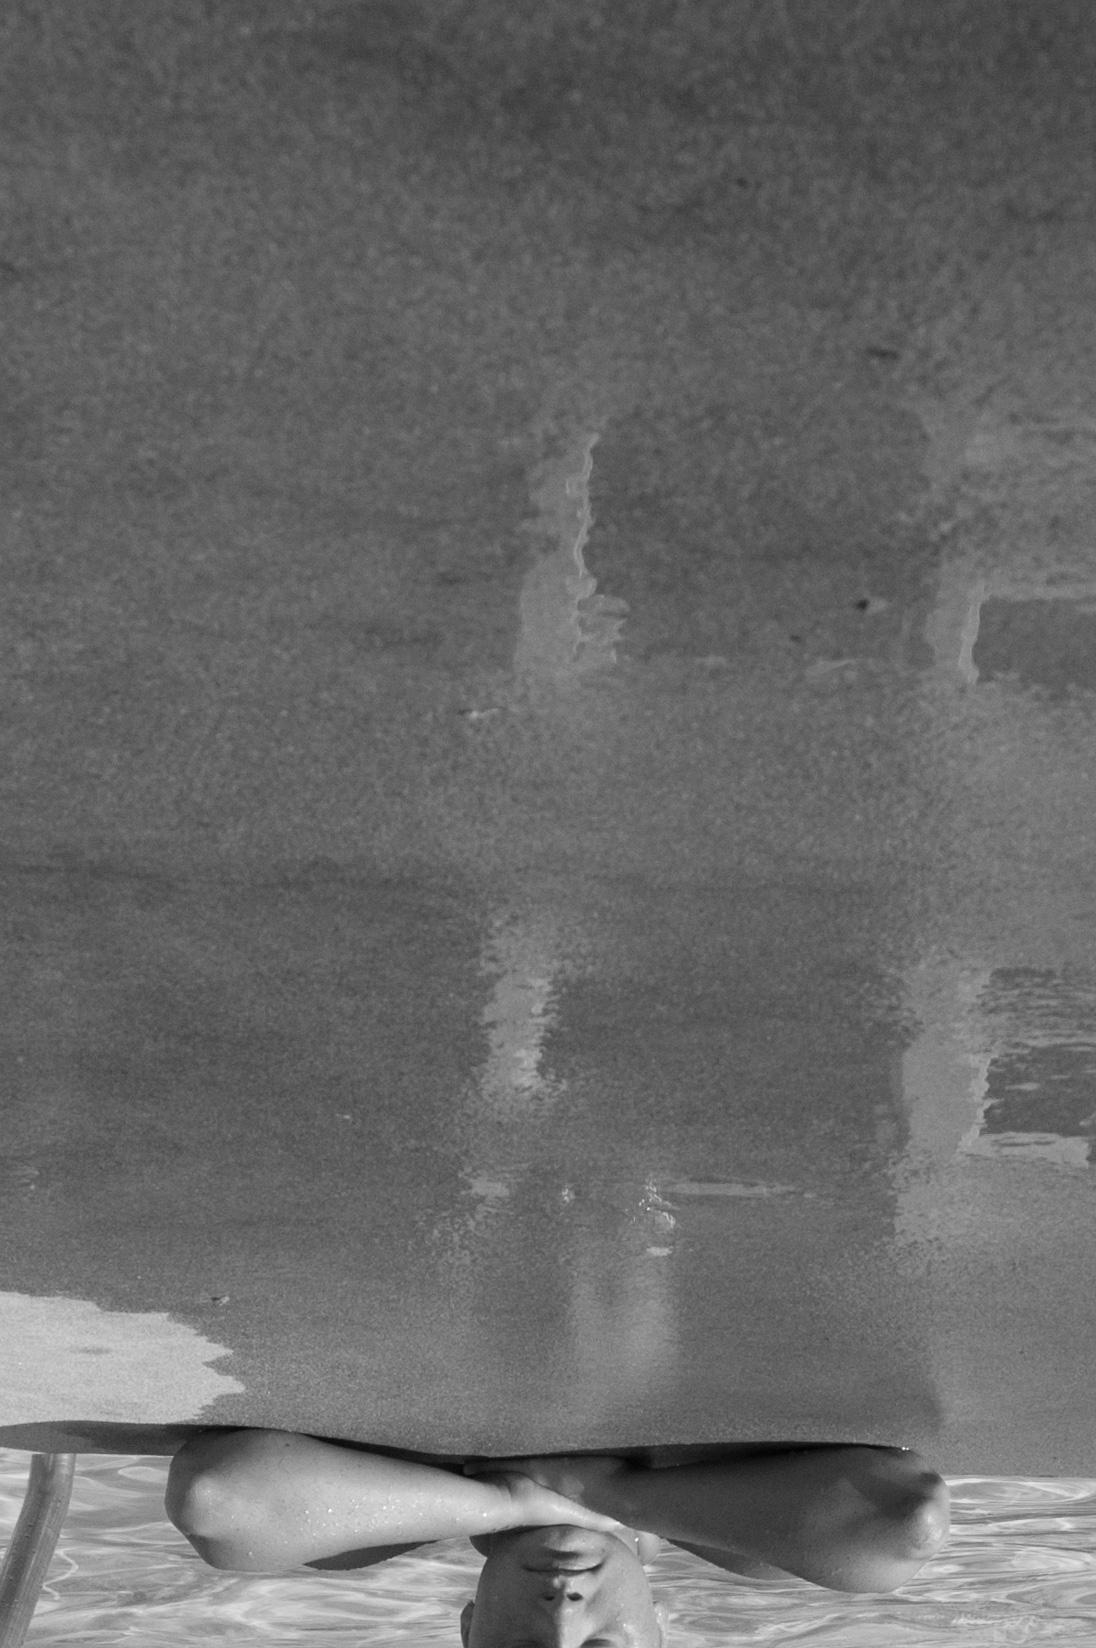 DSC_0081-1swimming shots 2.jpg